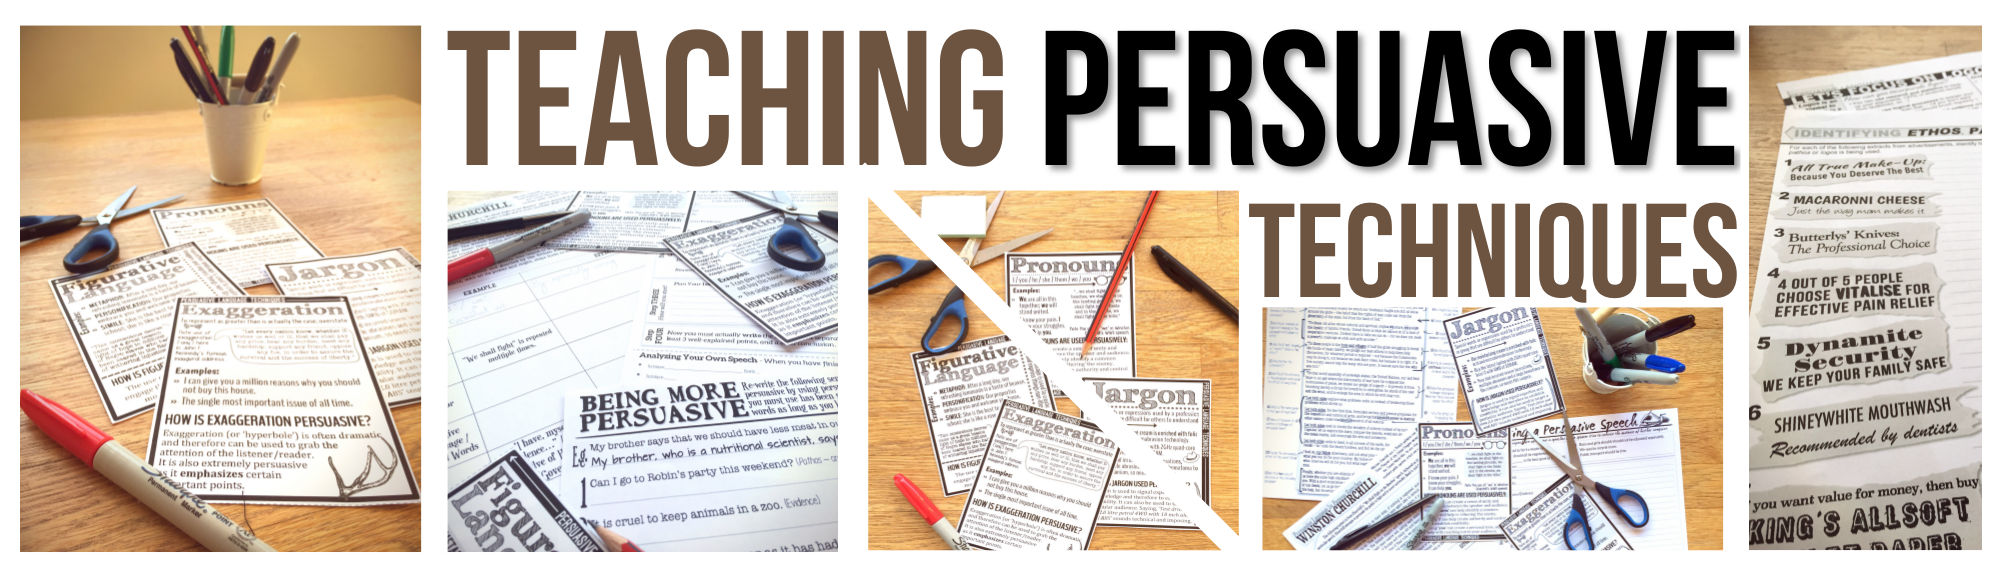 Teaching Persuasive Techniques - Stacey Lloyd Teaching